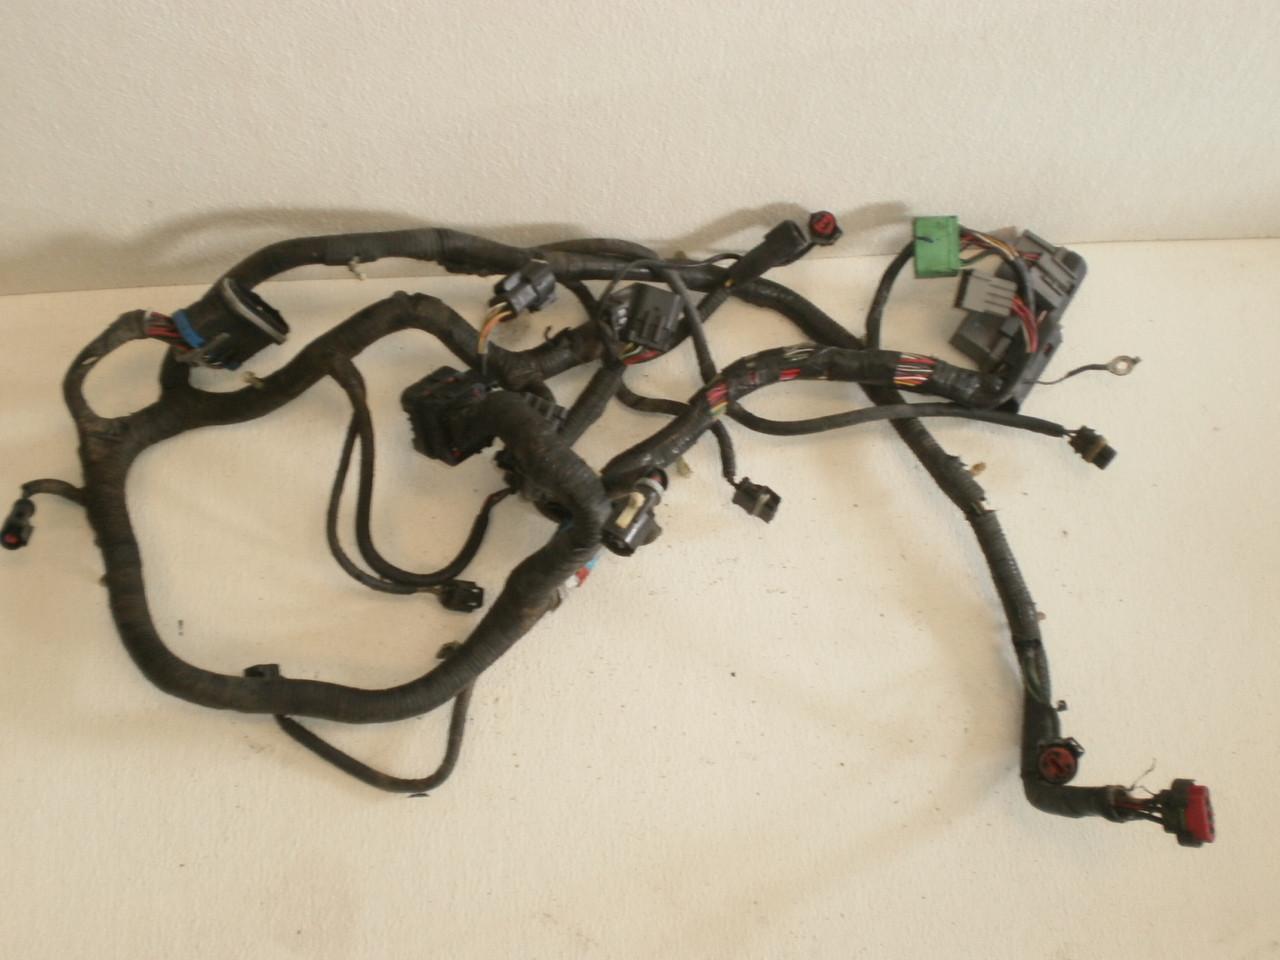 2001 mustang alternator wiring harness wiring diagram schematics 2001 mustang gt engine wiring harness 01 mustang [ 1280 x 960 Pixel ]